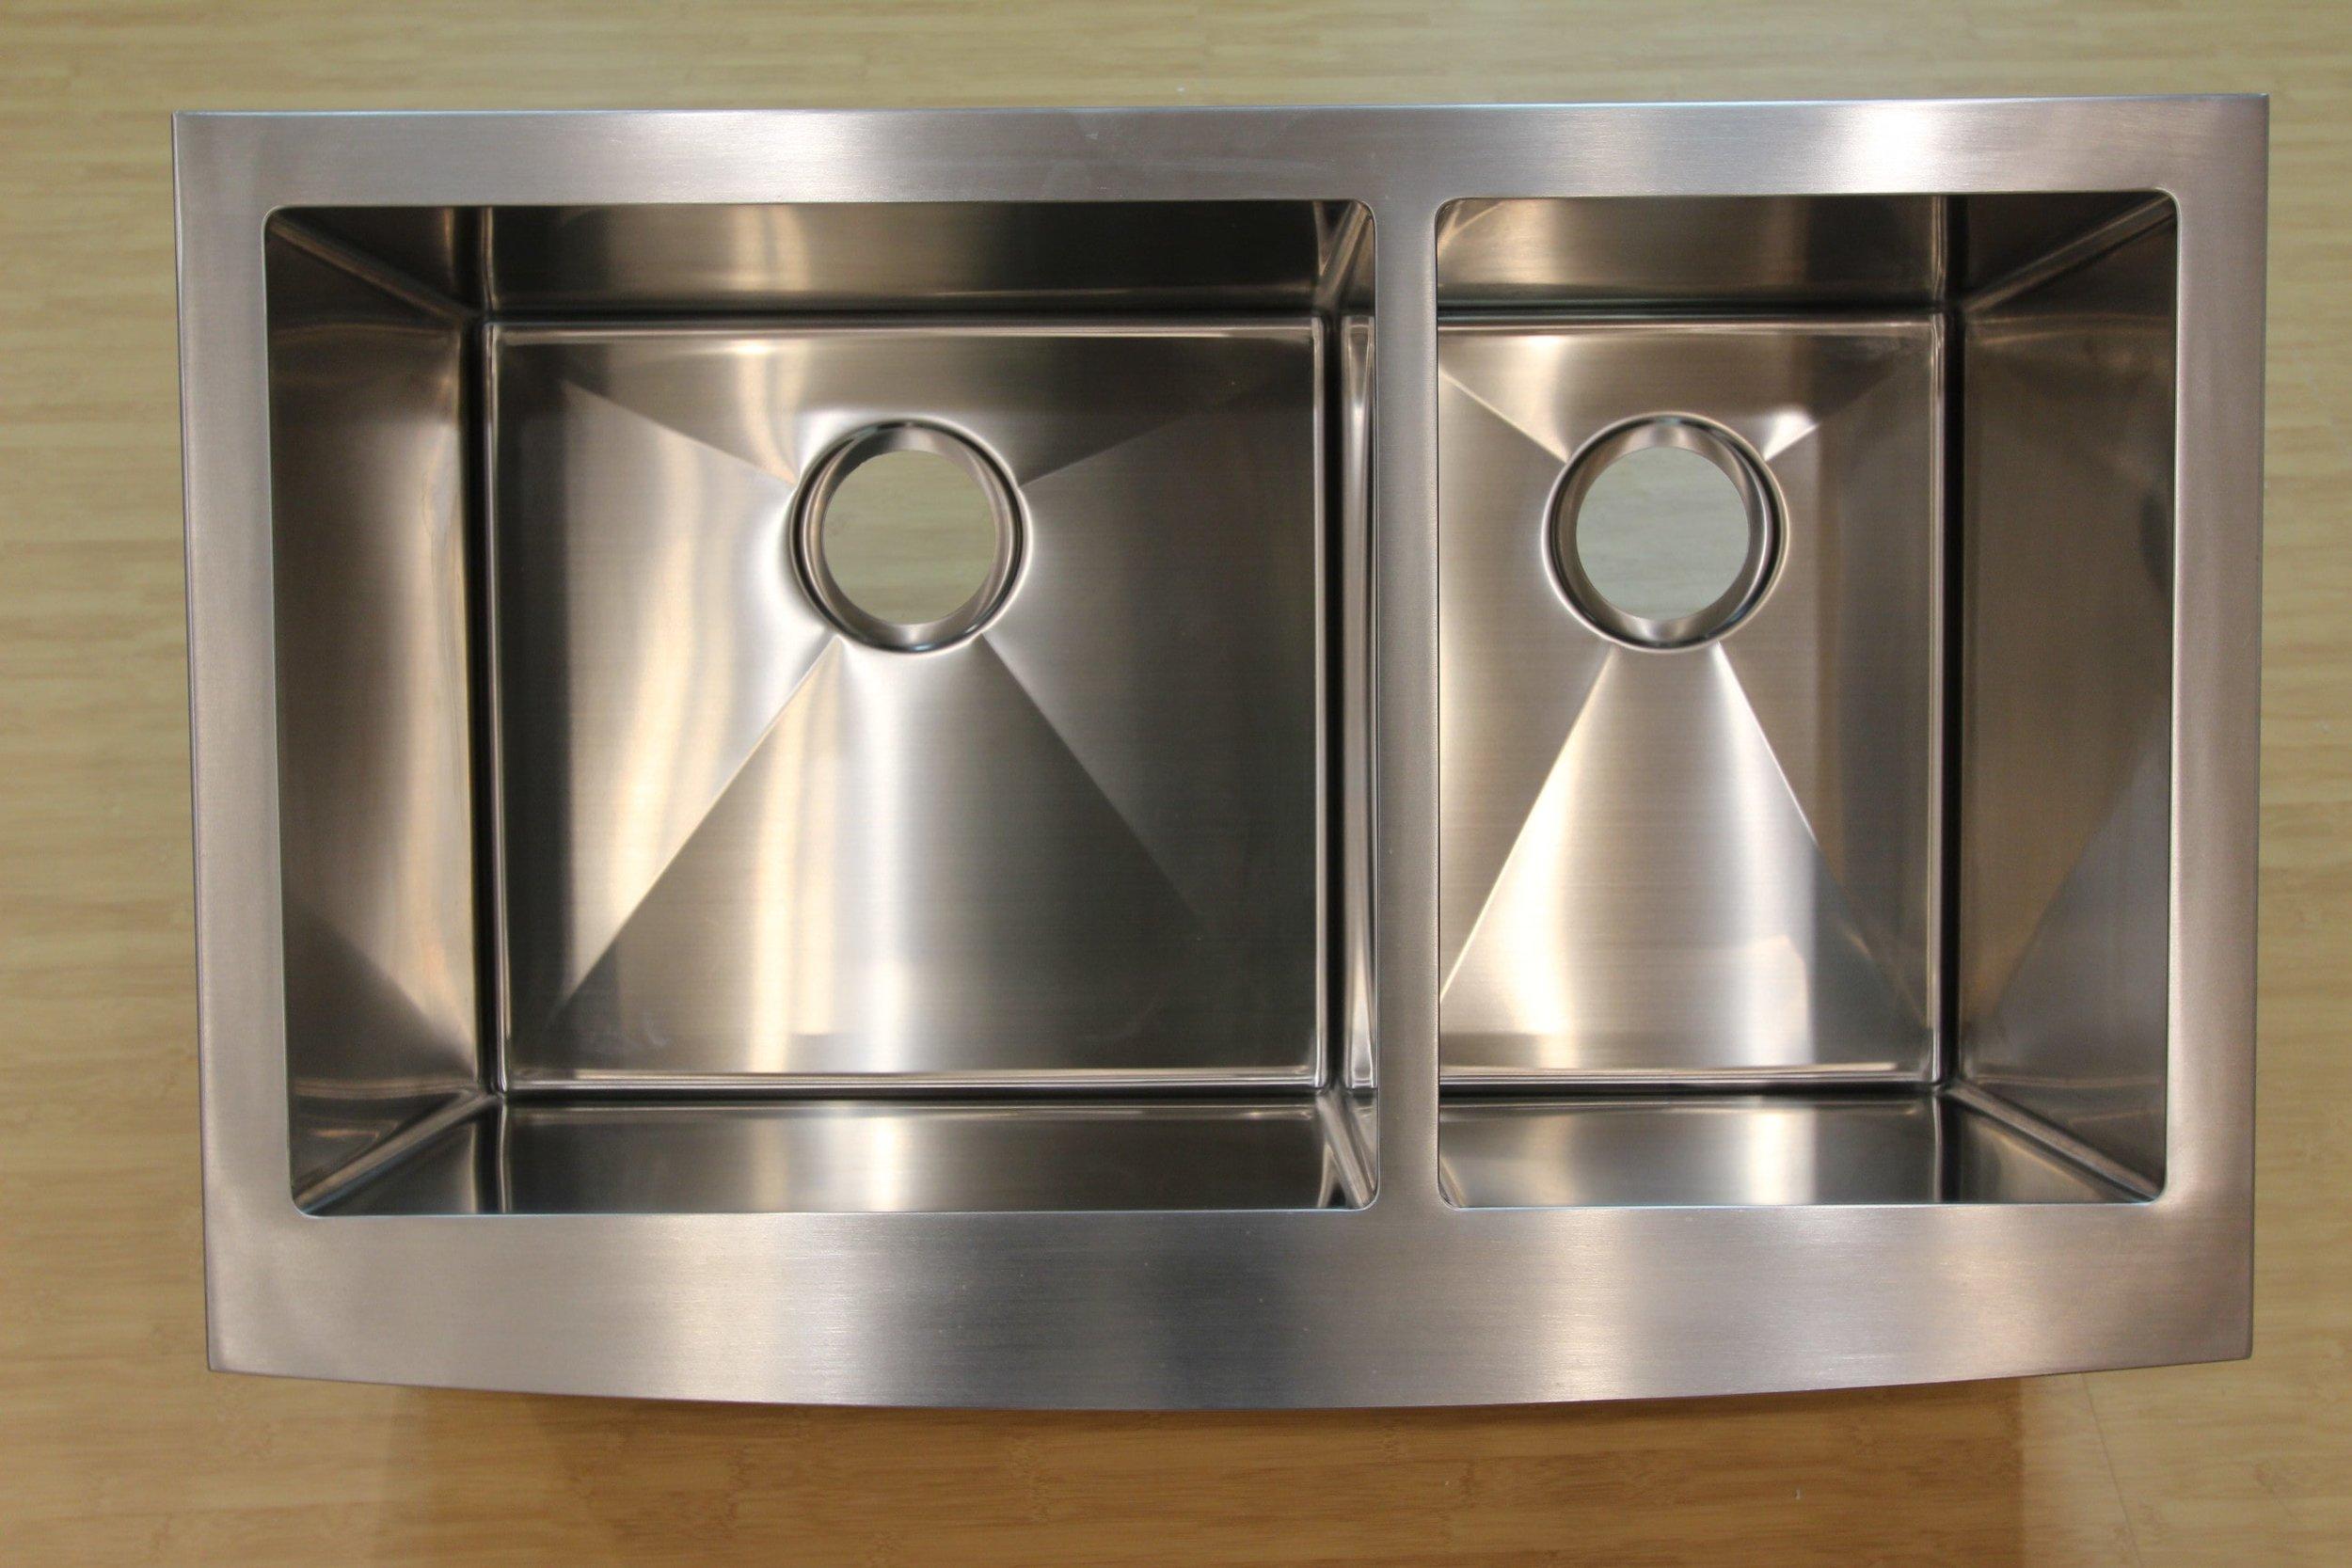 Stainless Steel Kitchen Double Farm Sink.JPG